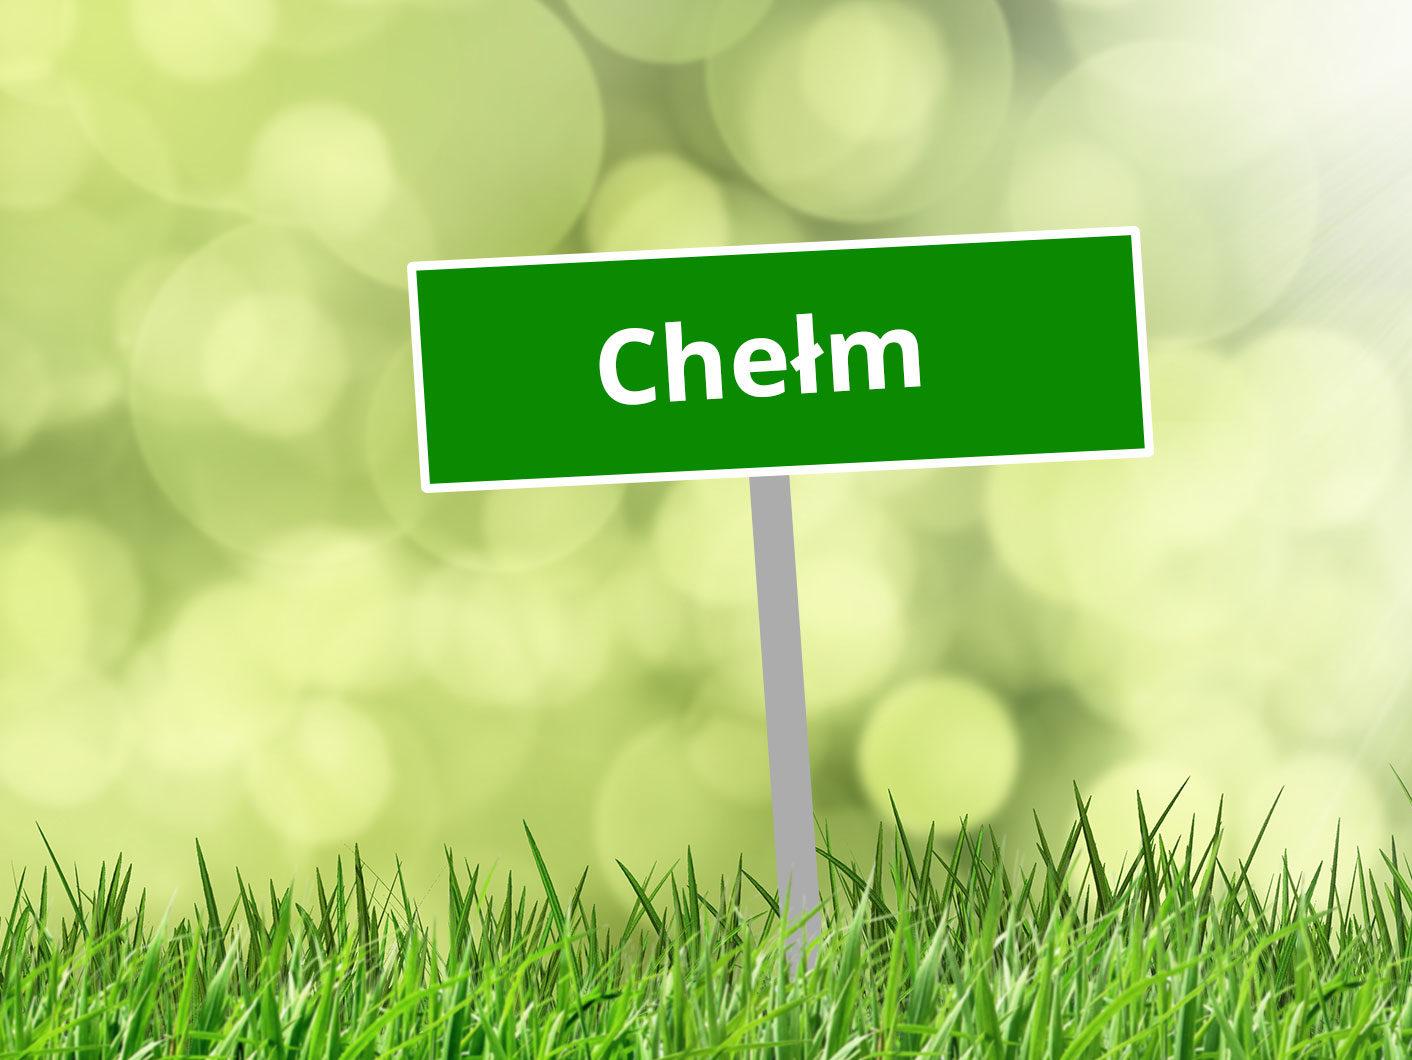 Sołectwo Chełm